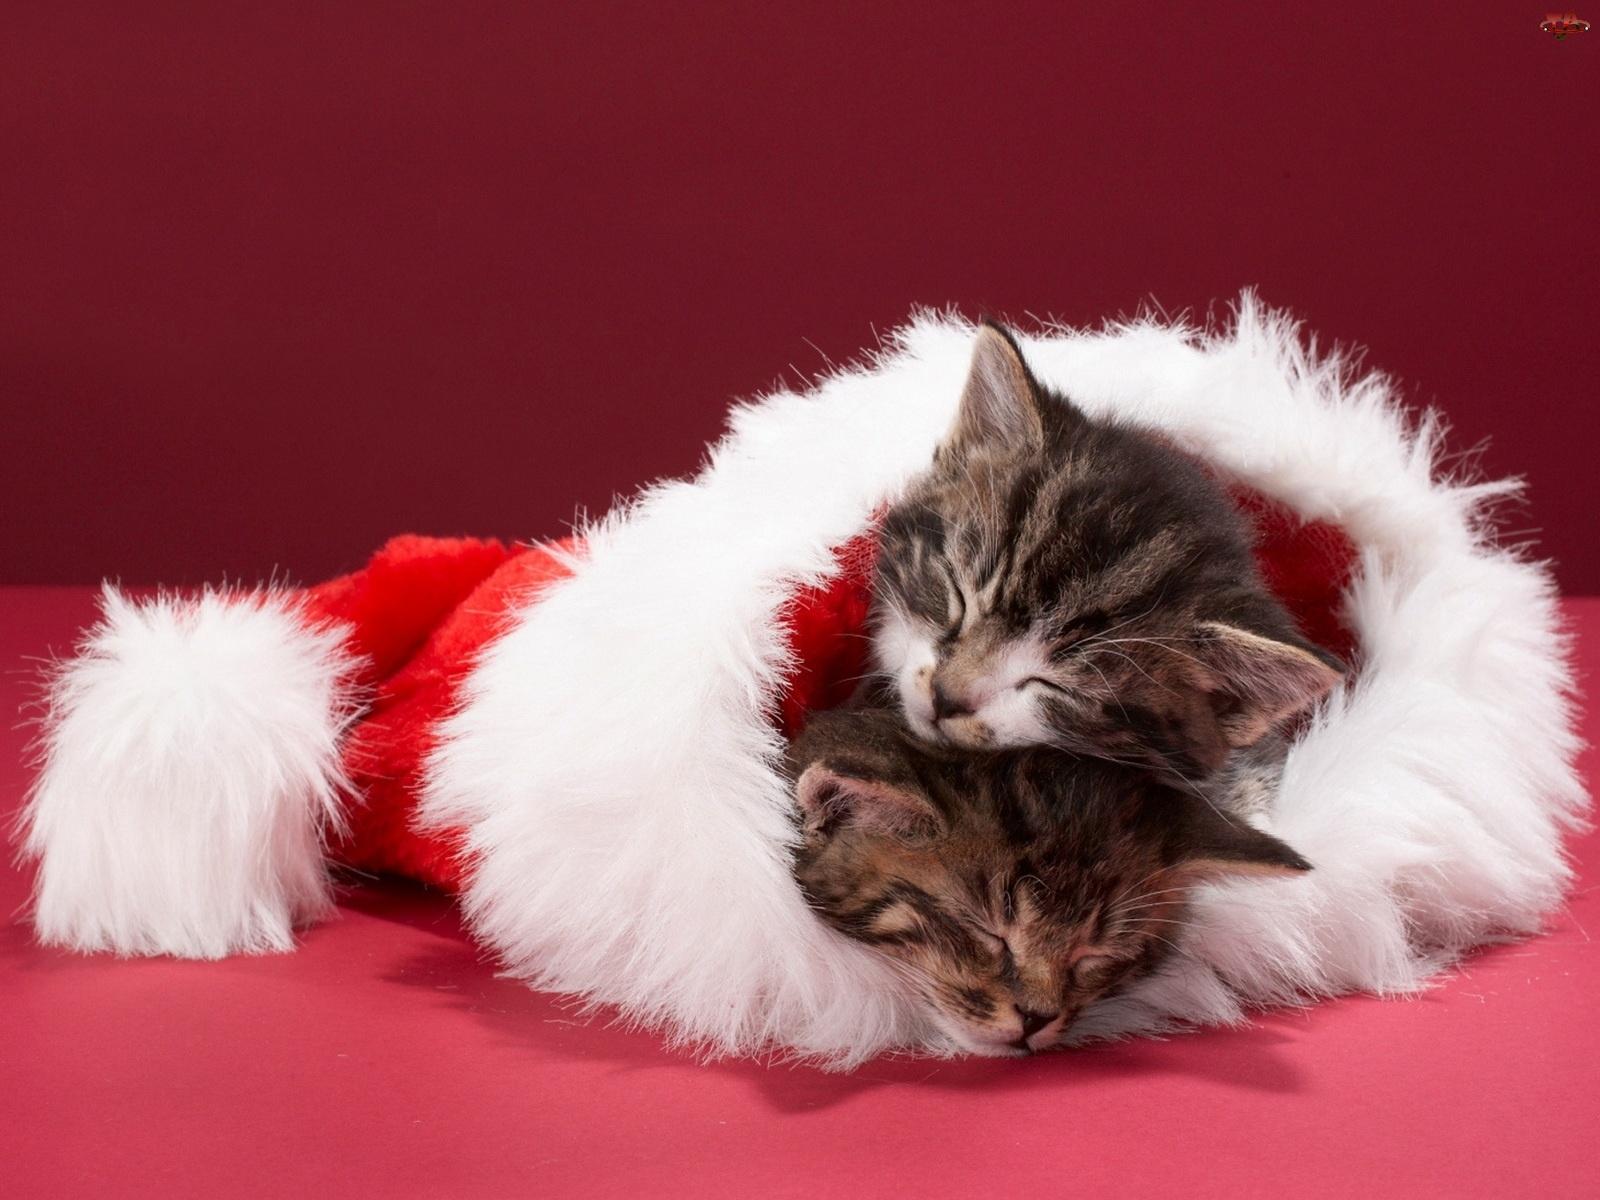 49 Free Christmas Wallpaper With Cats On Wallpapersafari